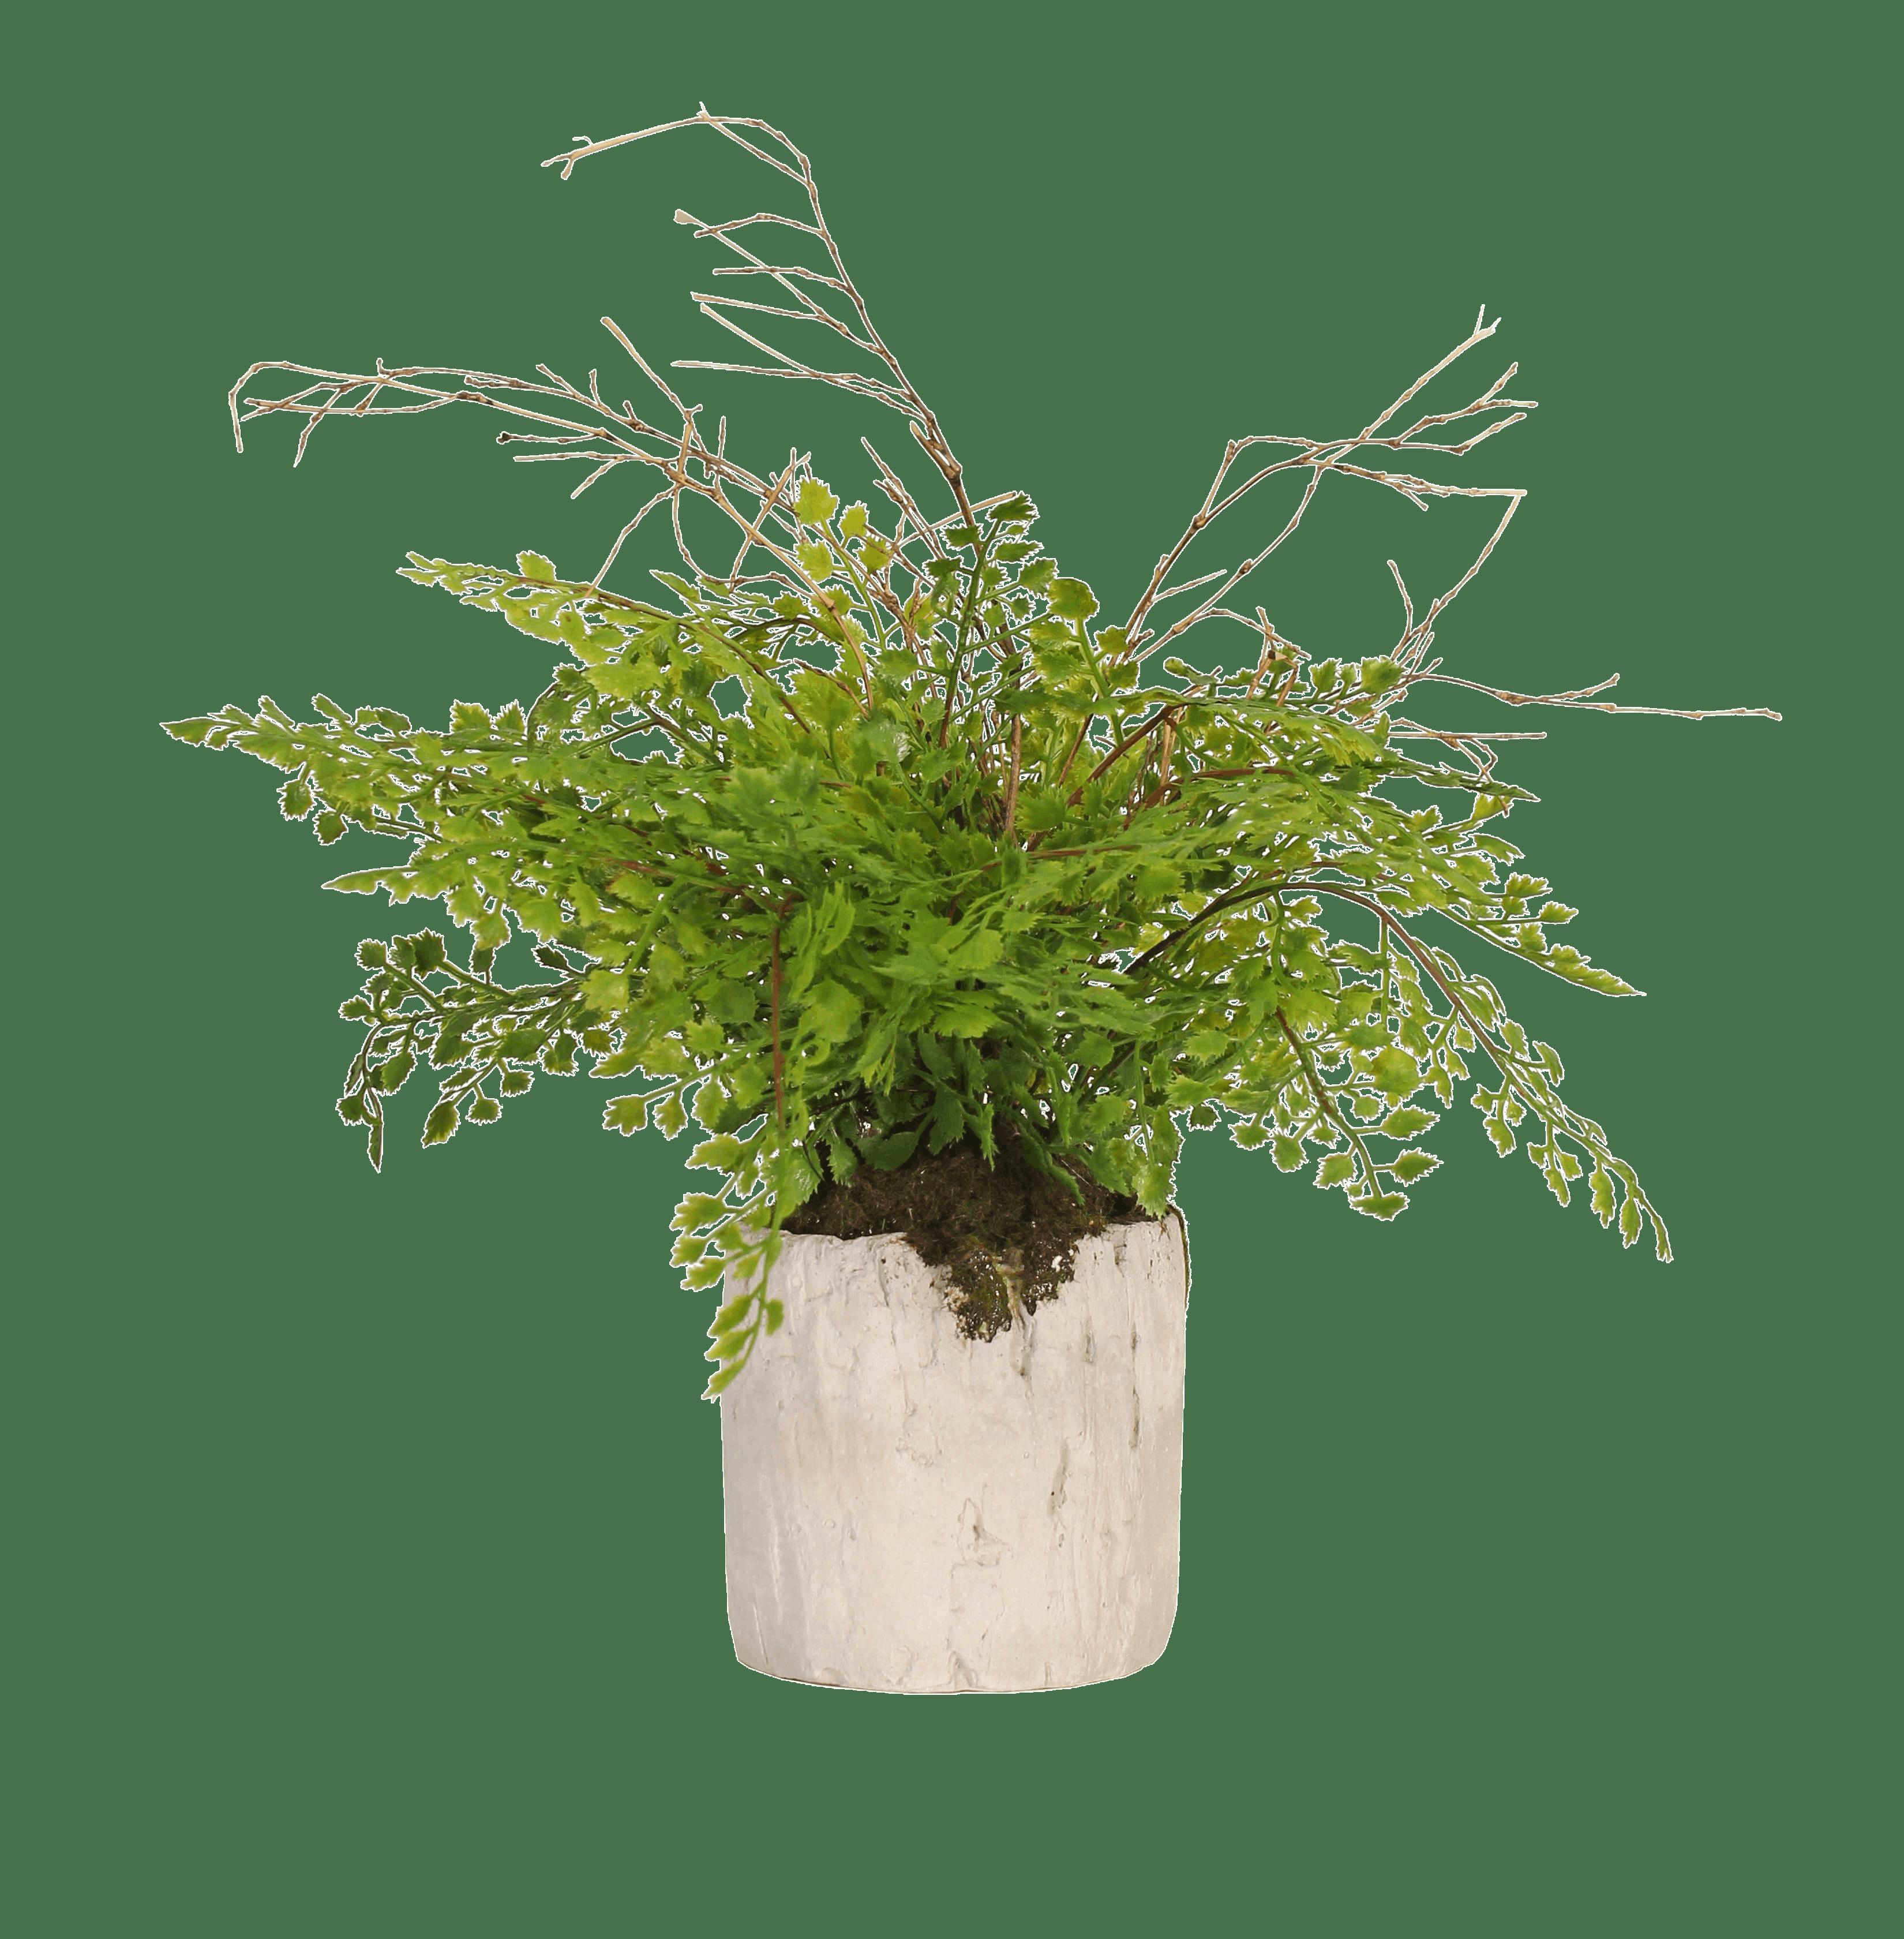 Artificial maidenhair fern